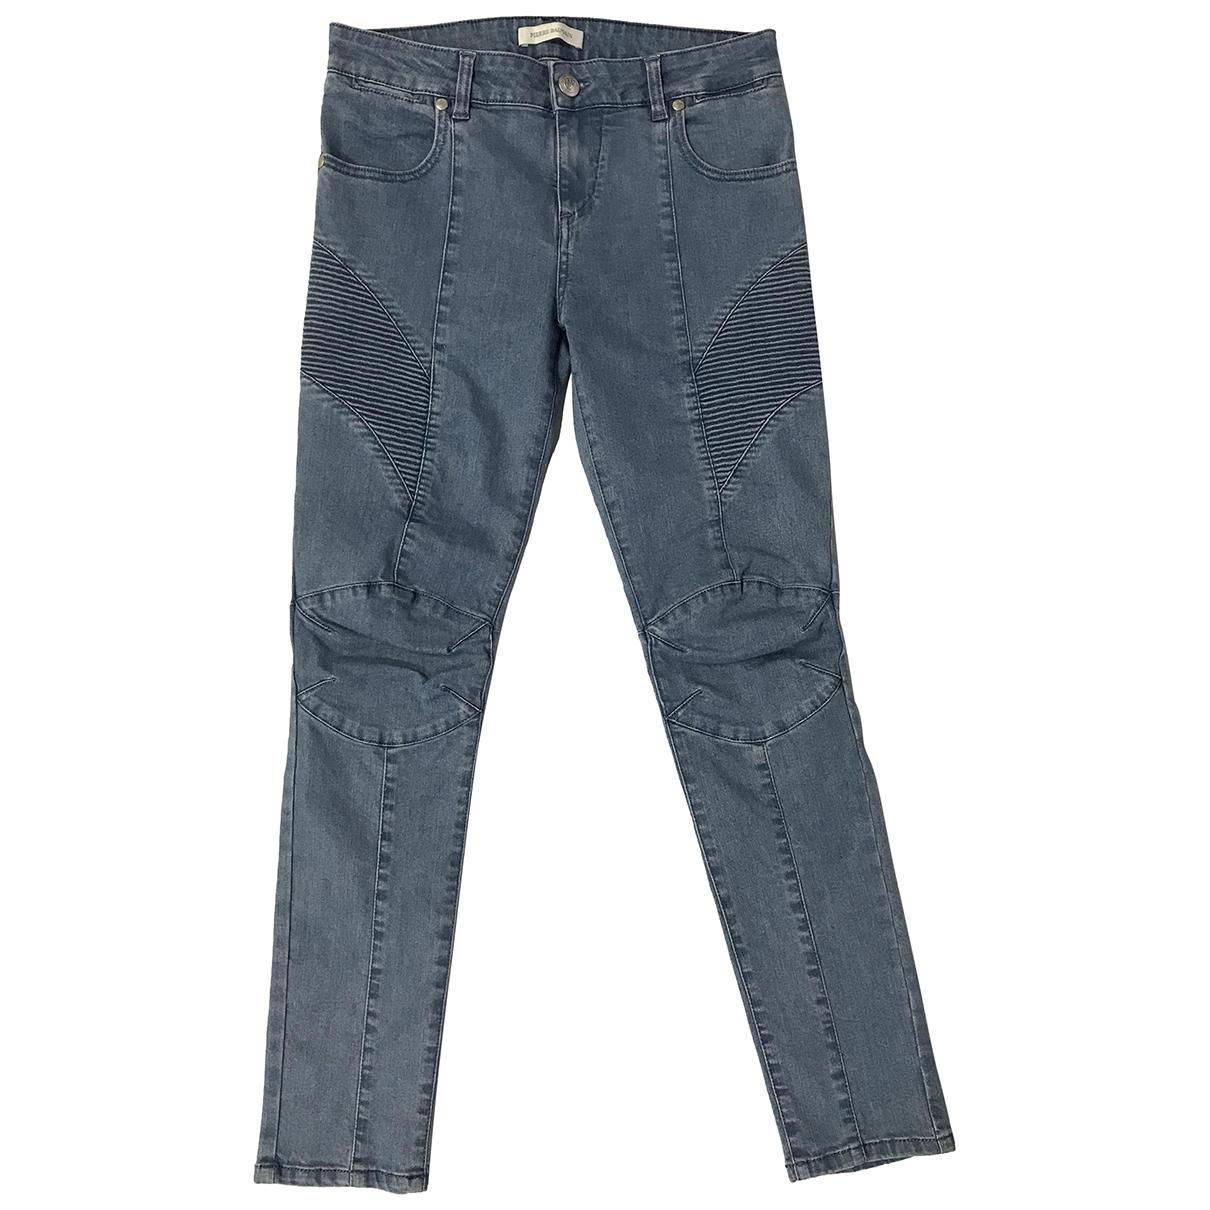 Pierre Balmain \N Blue Cotton - elasthane Jeans for Women 30 US